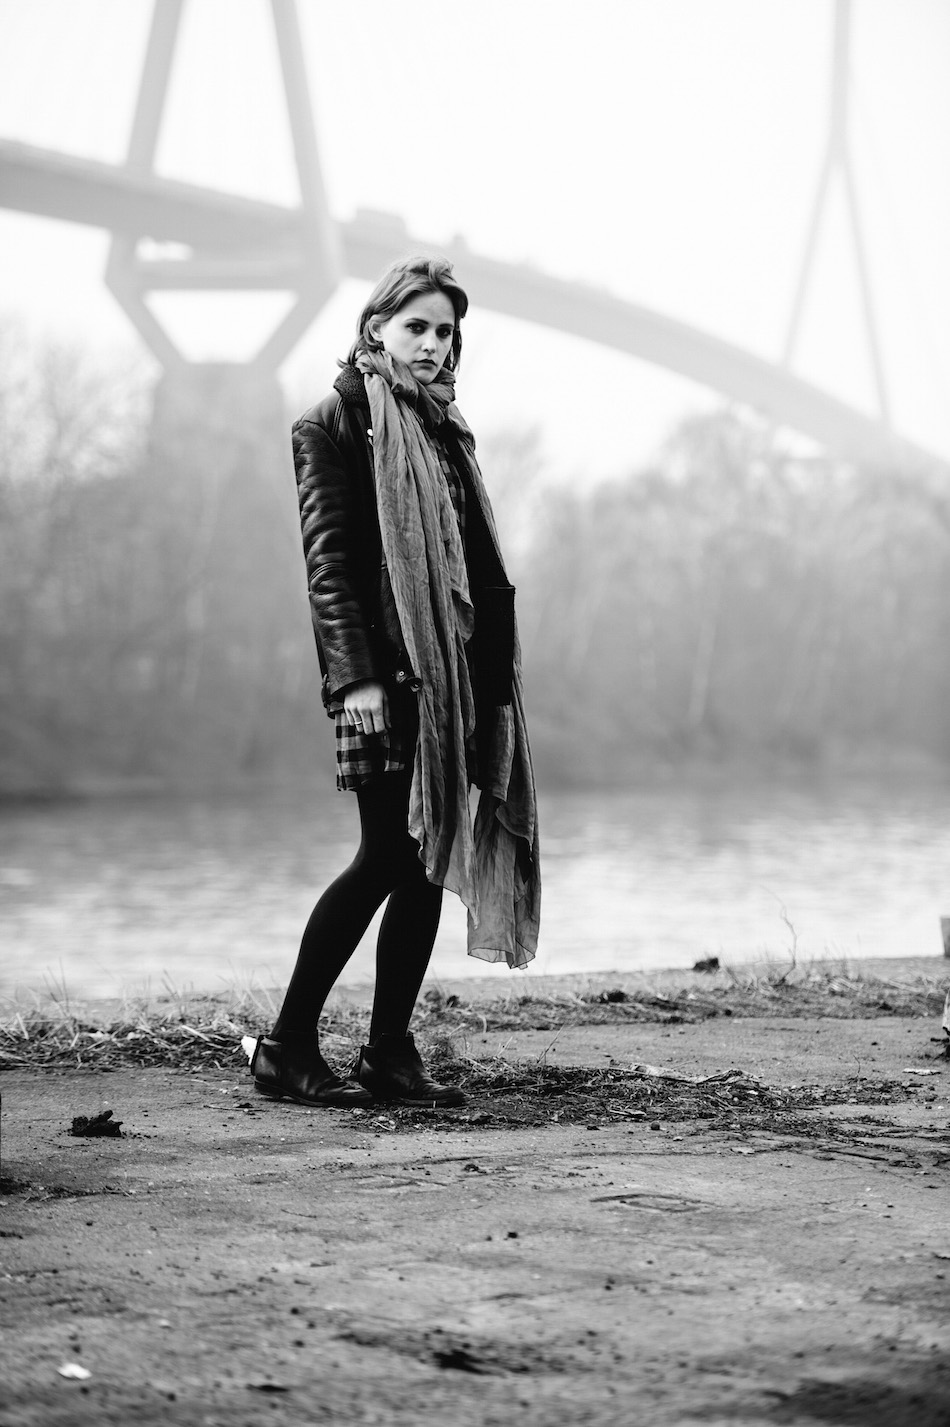 bridging_the_gap_outfit_post_fridafridafrida_fashion_blog_nisl_hasenau_mindt_1